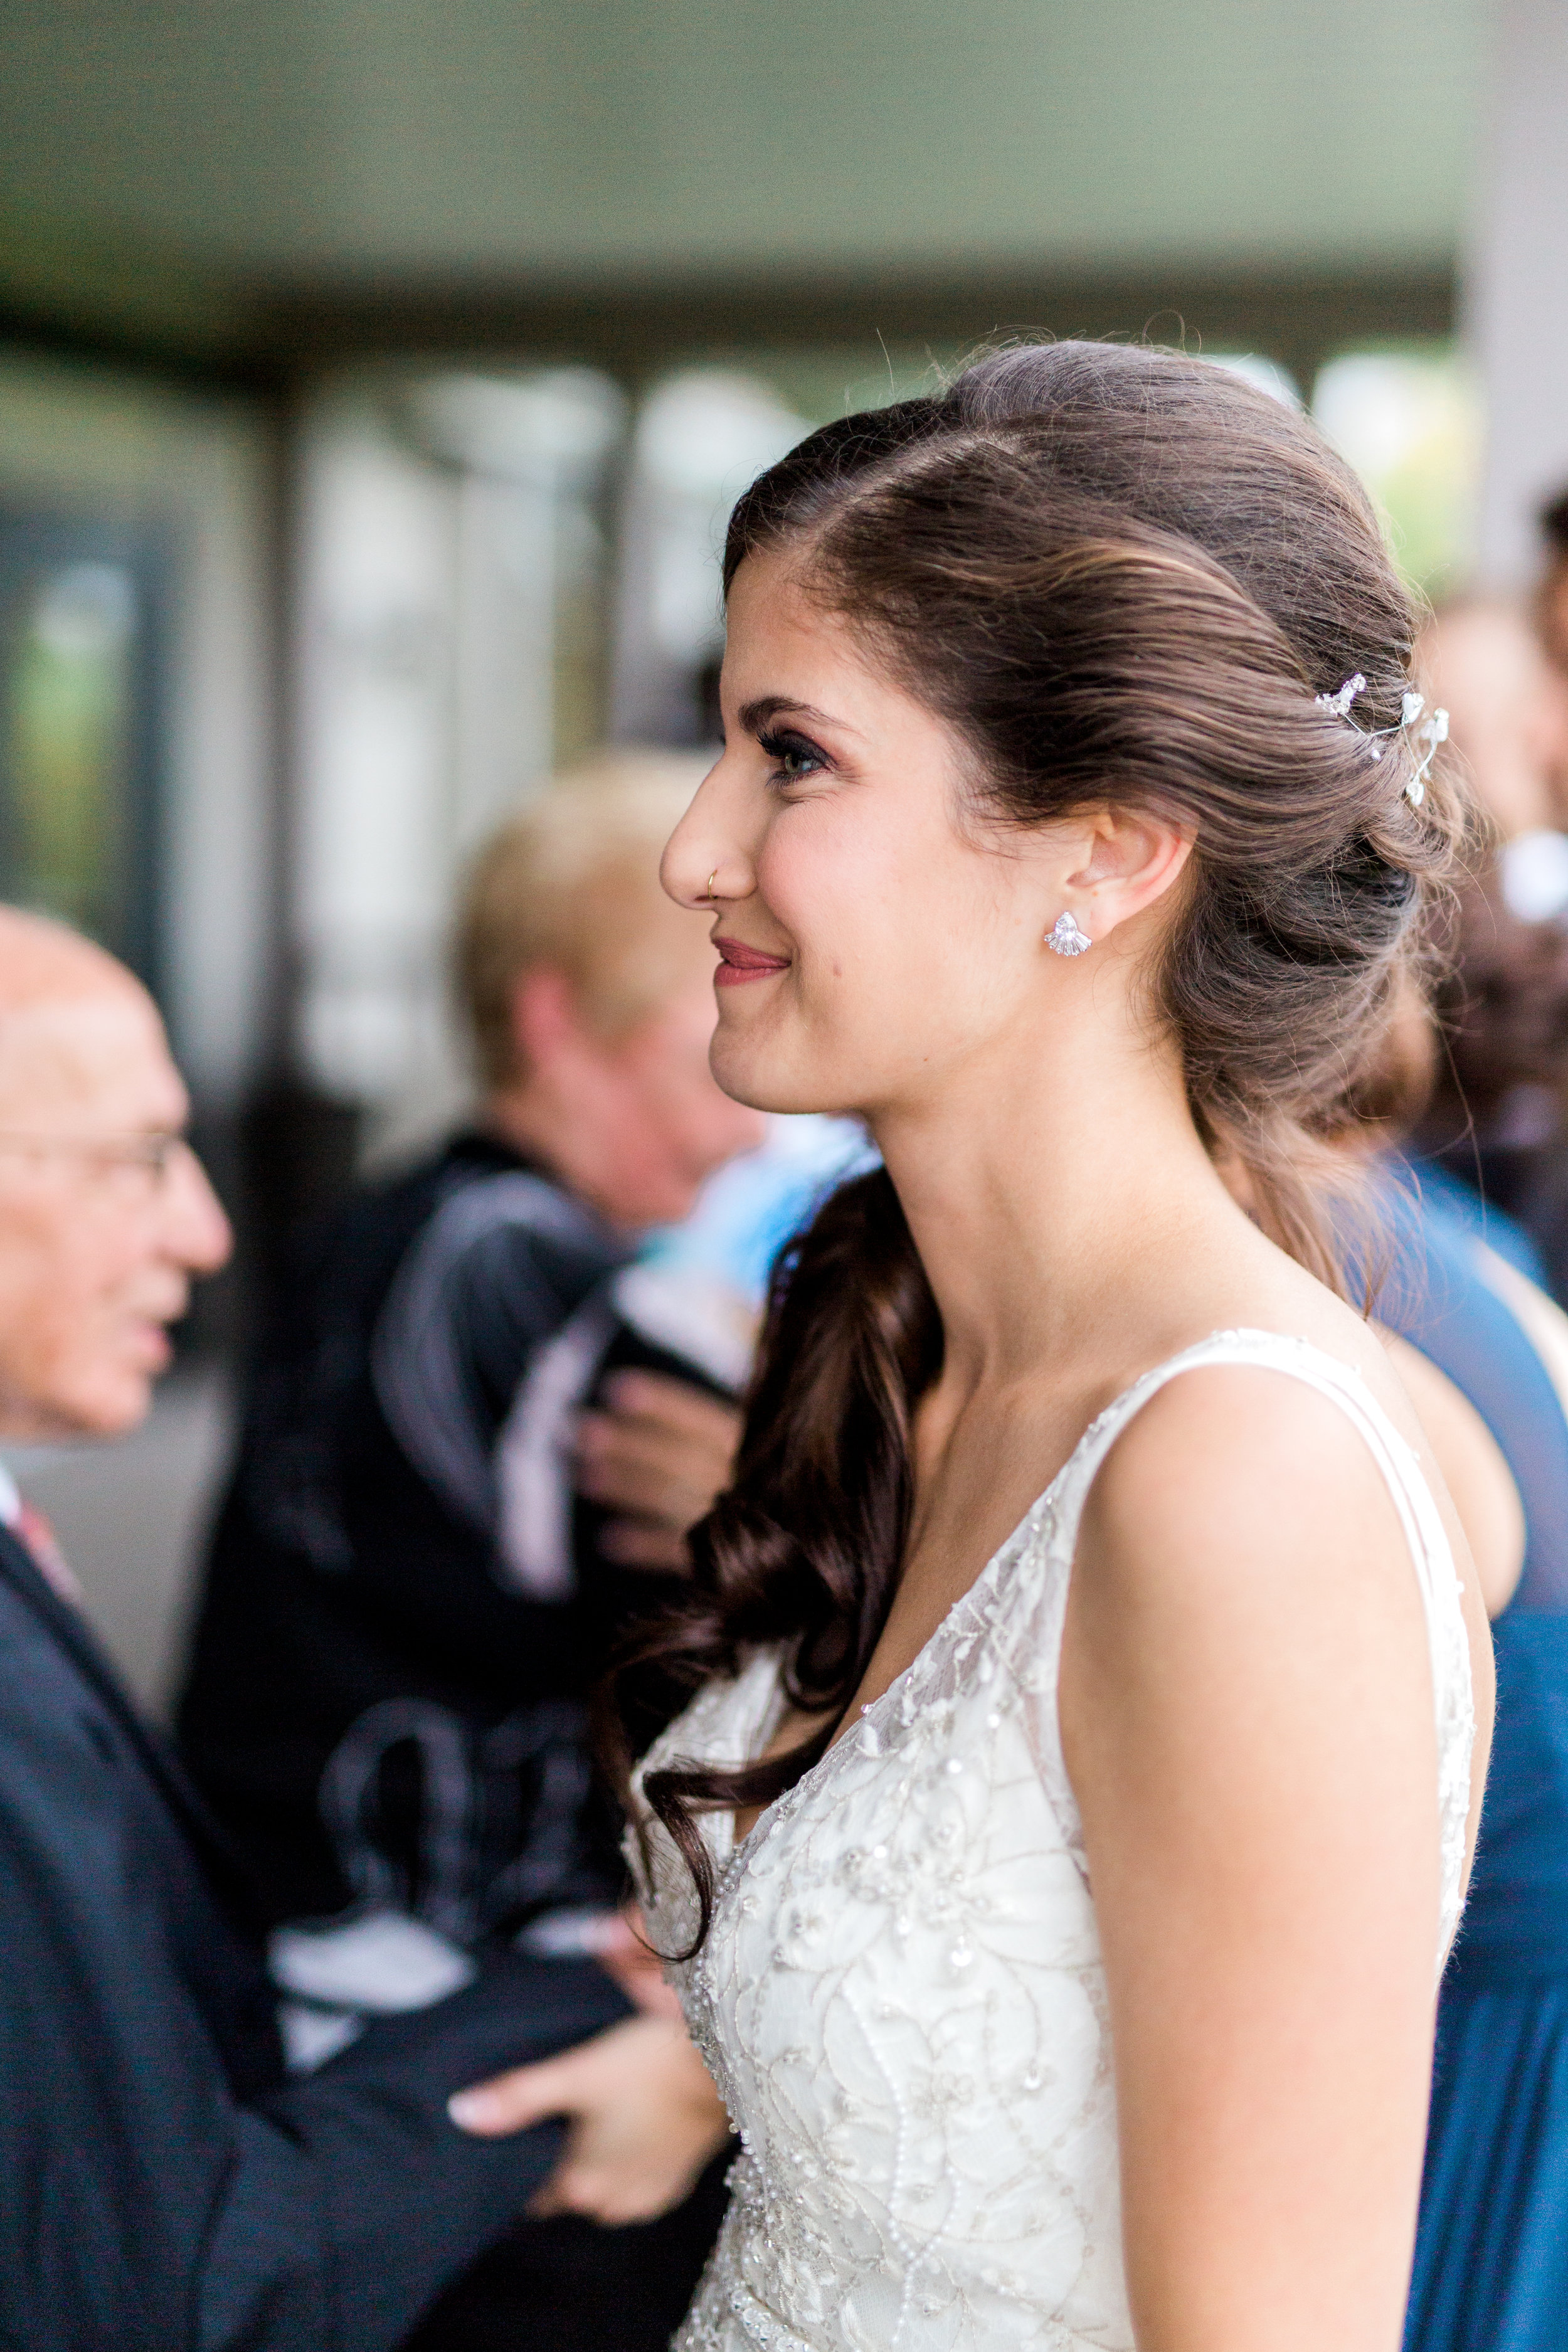 Amir-Golbazi-Danielle-Giroux-Photography_Toronto-Wedding_Cedarwood_Rachel-Paul_328.jpg